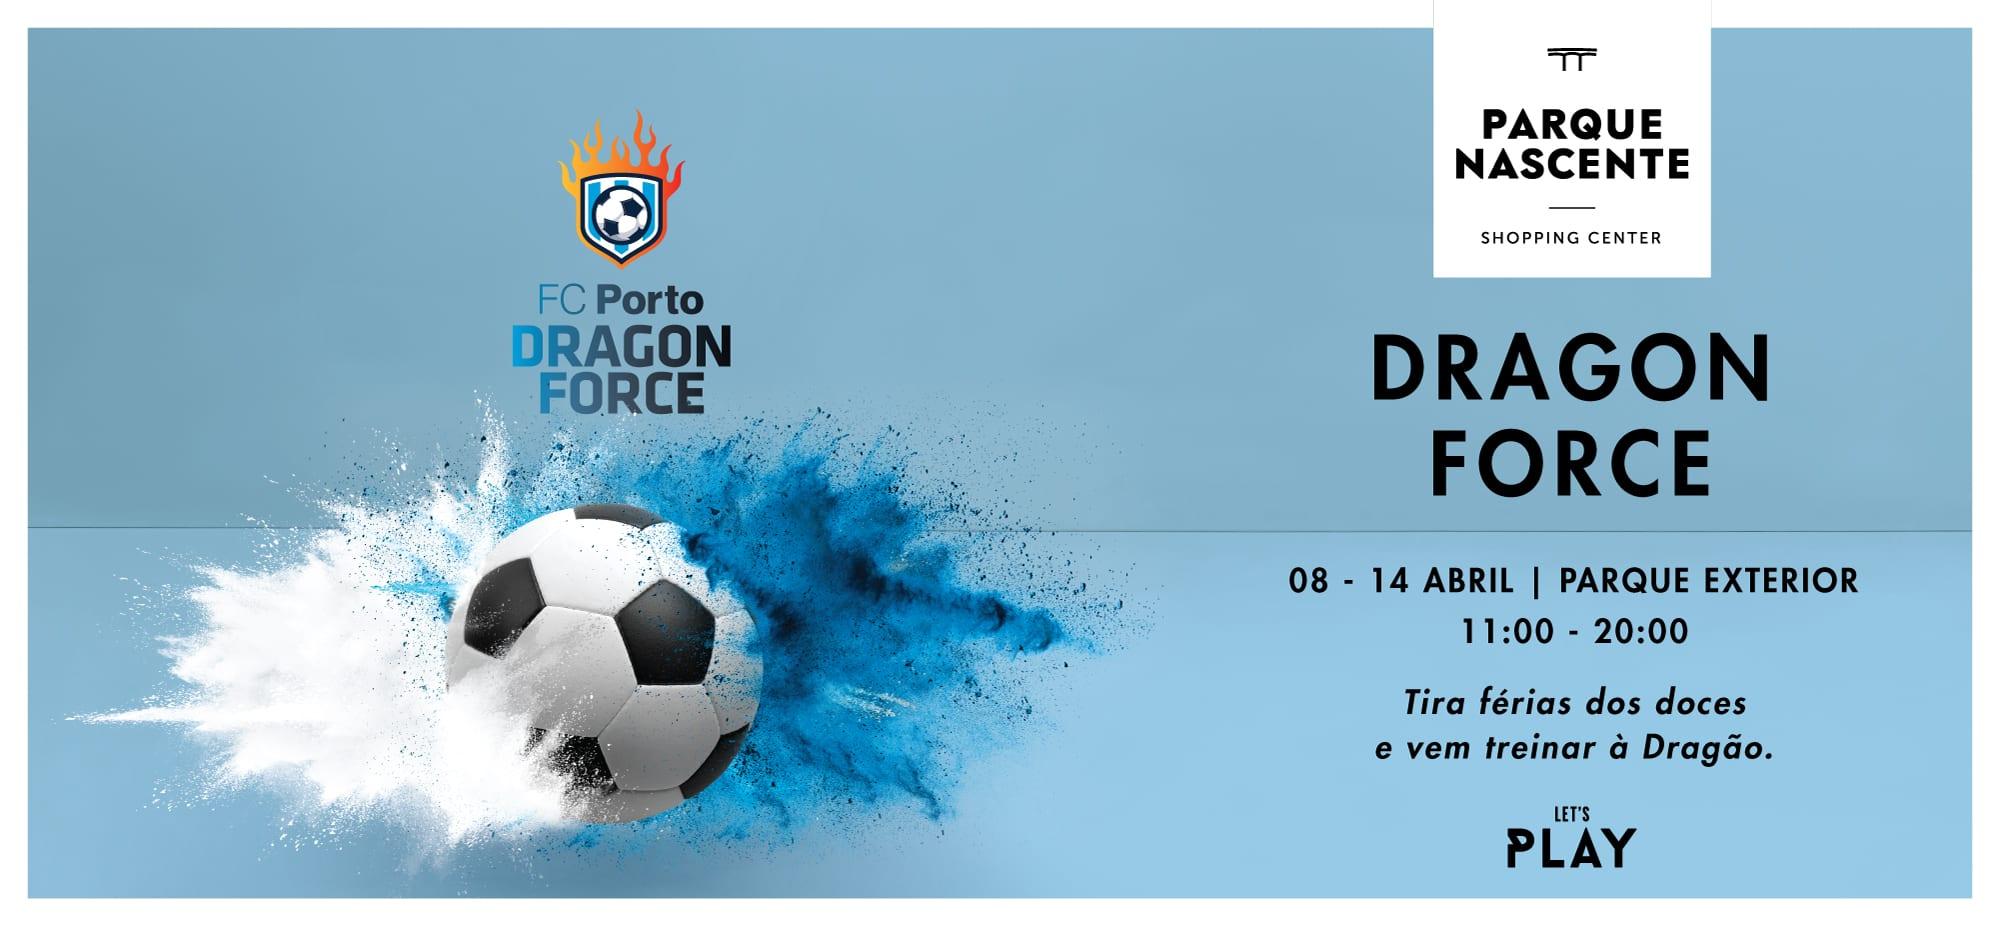 Dragon Force @ Parque Nascente